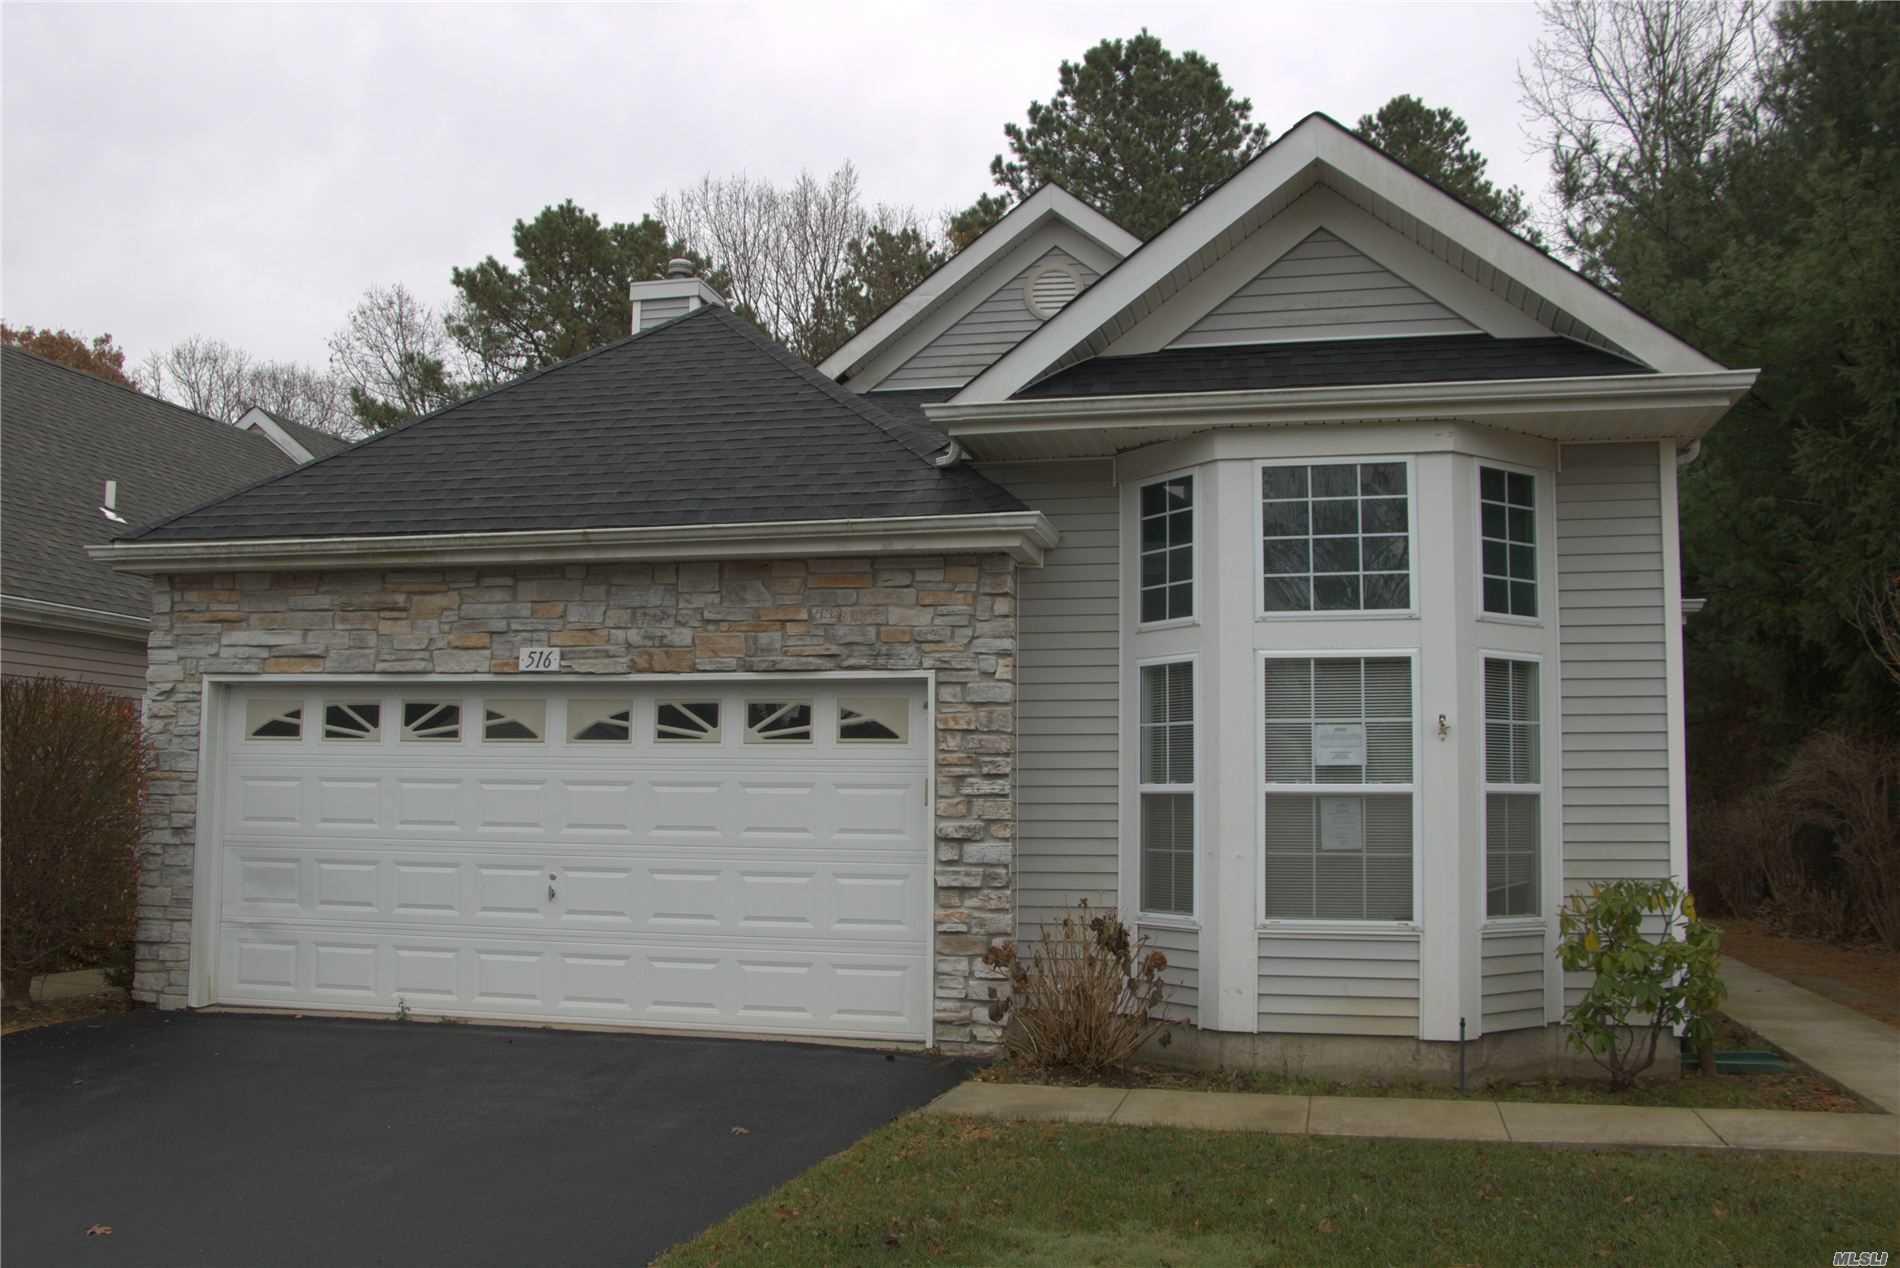 Property for sale at 516 Leisure Drive, Ridge NY 11961, Ridge,  New York 11961